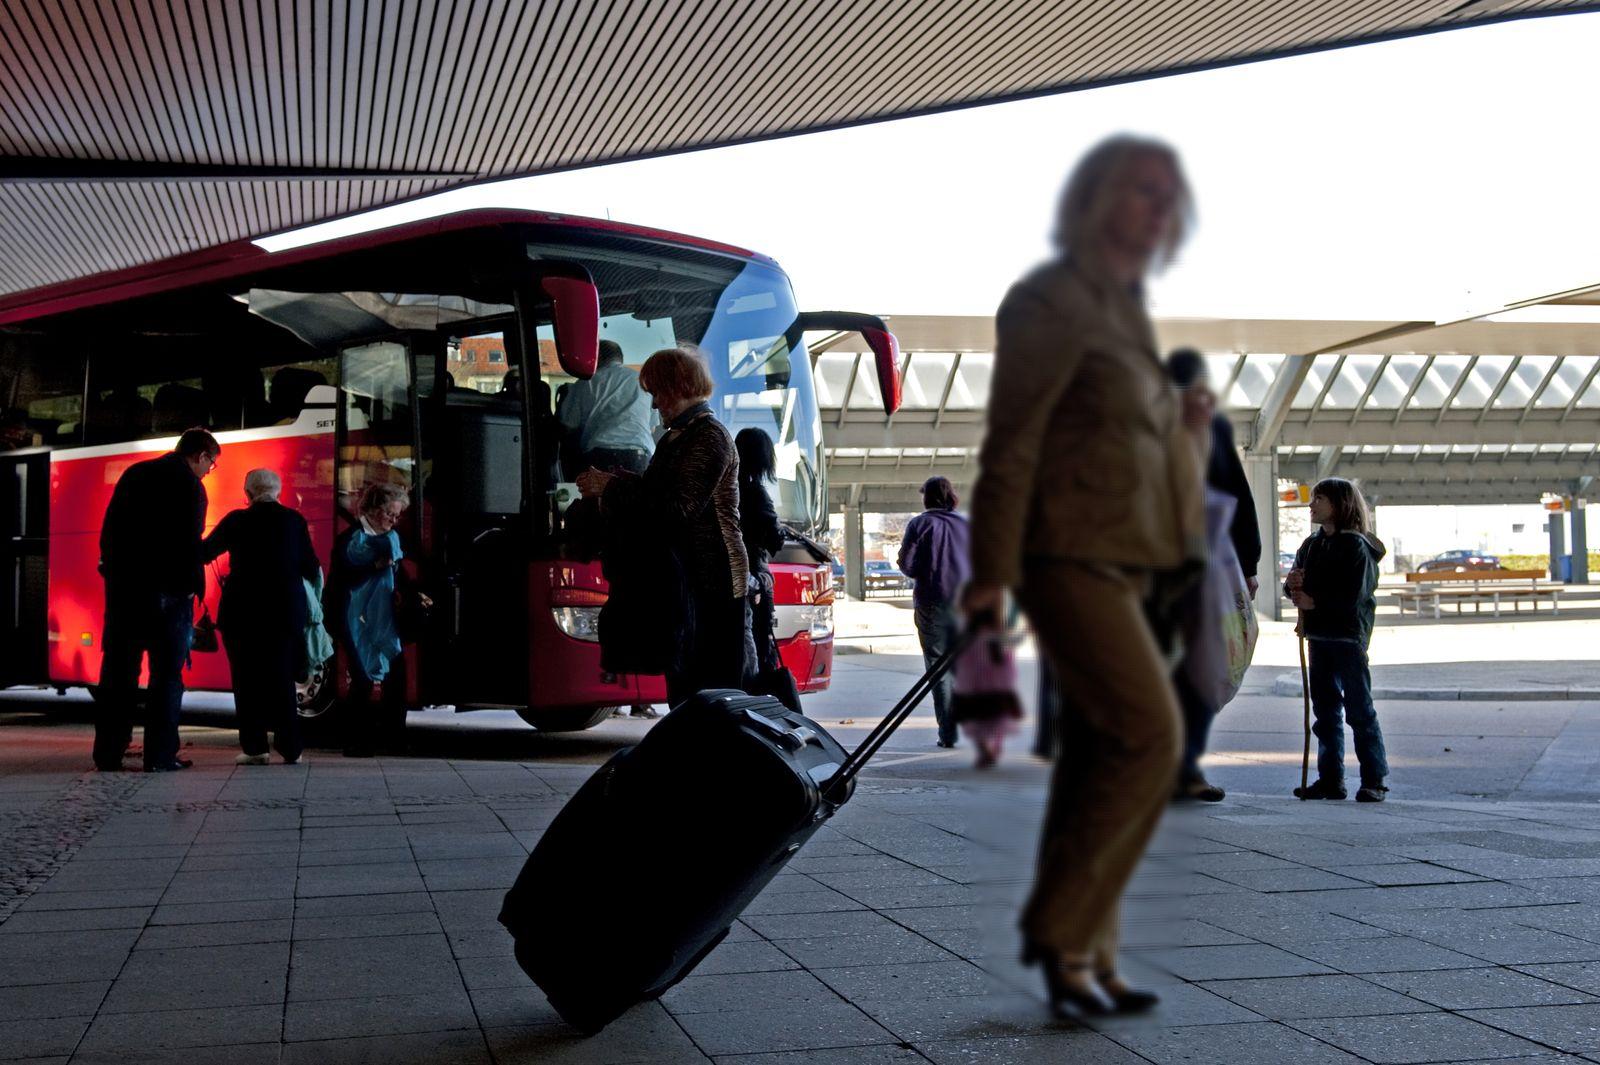 Fernbus / Reisebus / Busreisende